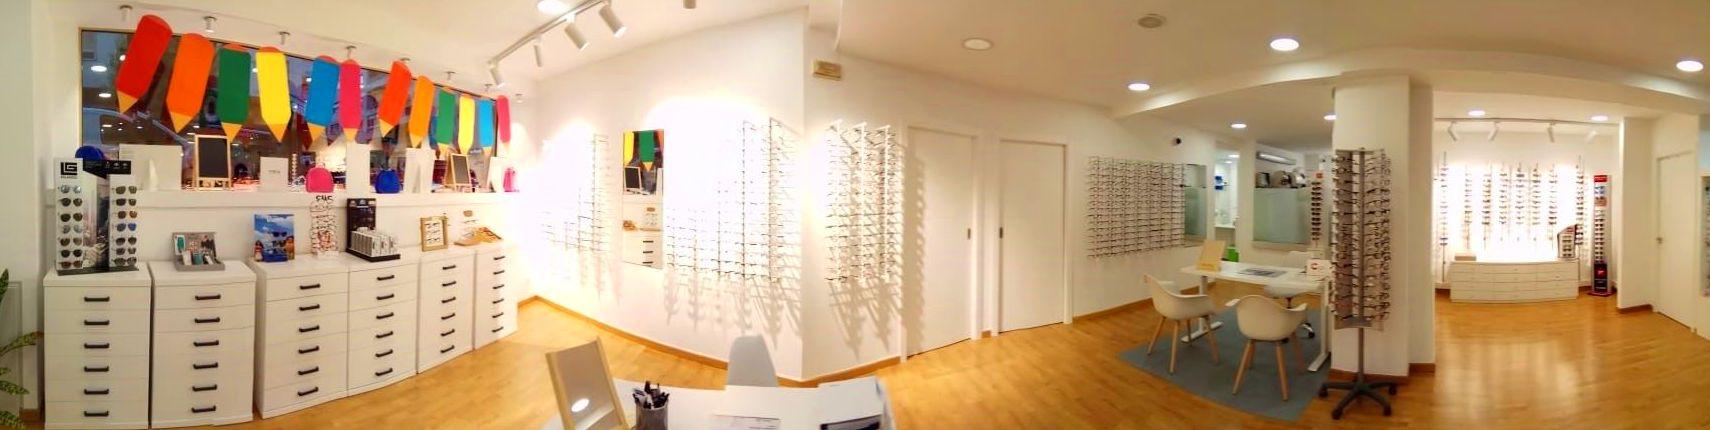 Foto 3 de Ópticas en Vigo | ÓPTICA PRISMALEN             Nº reg. sanitario: E-36-000 230